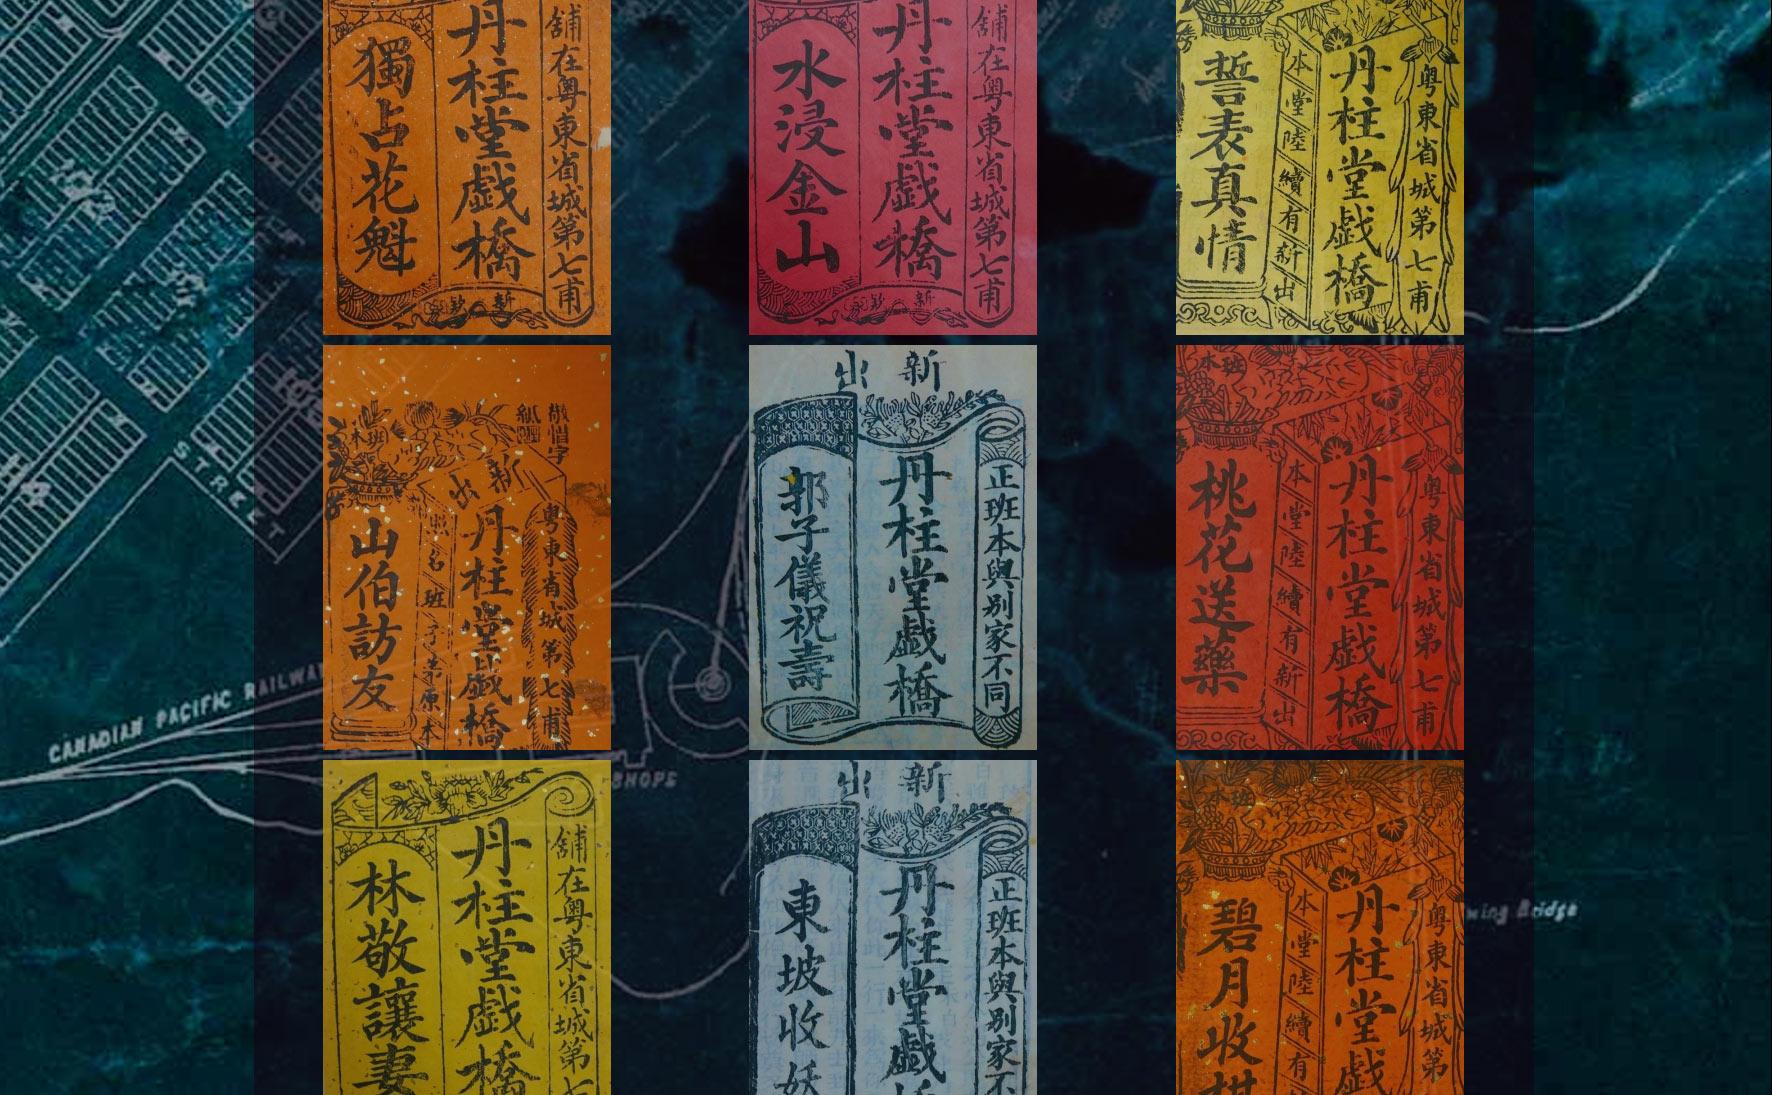 Underwater Chinatown - Opera Brochures